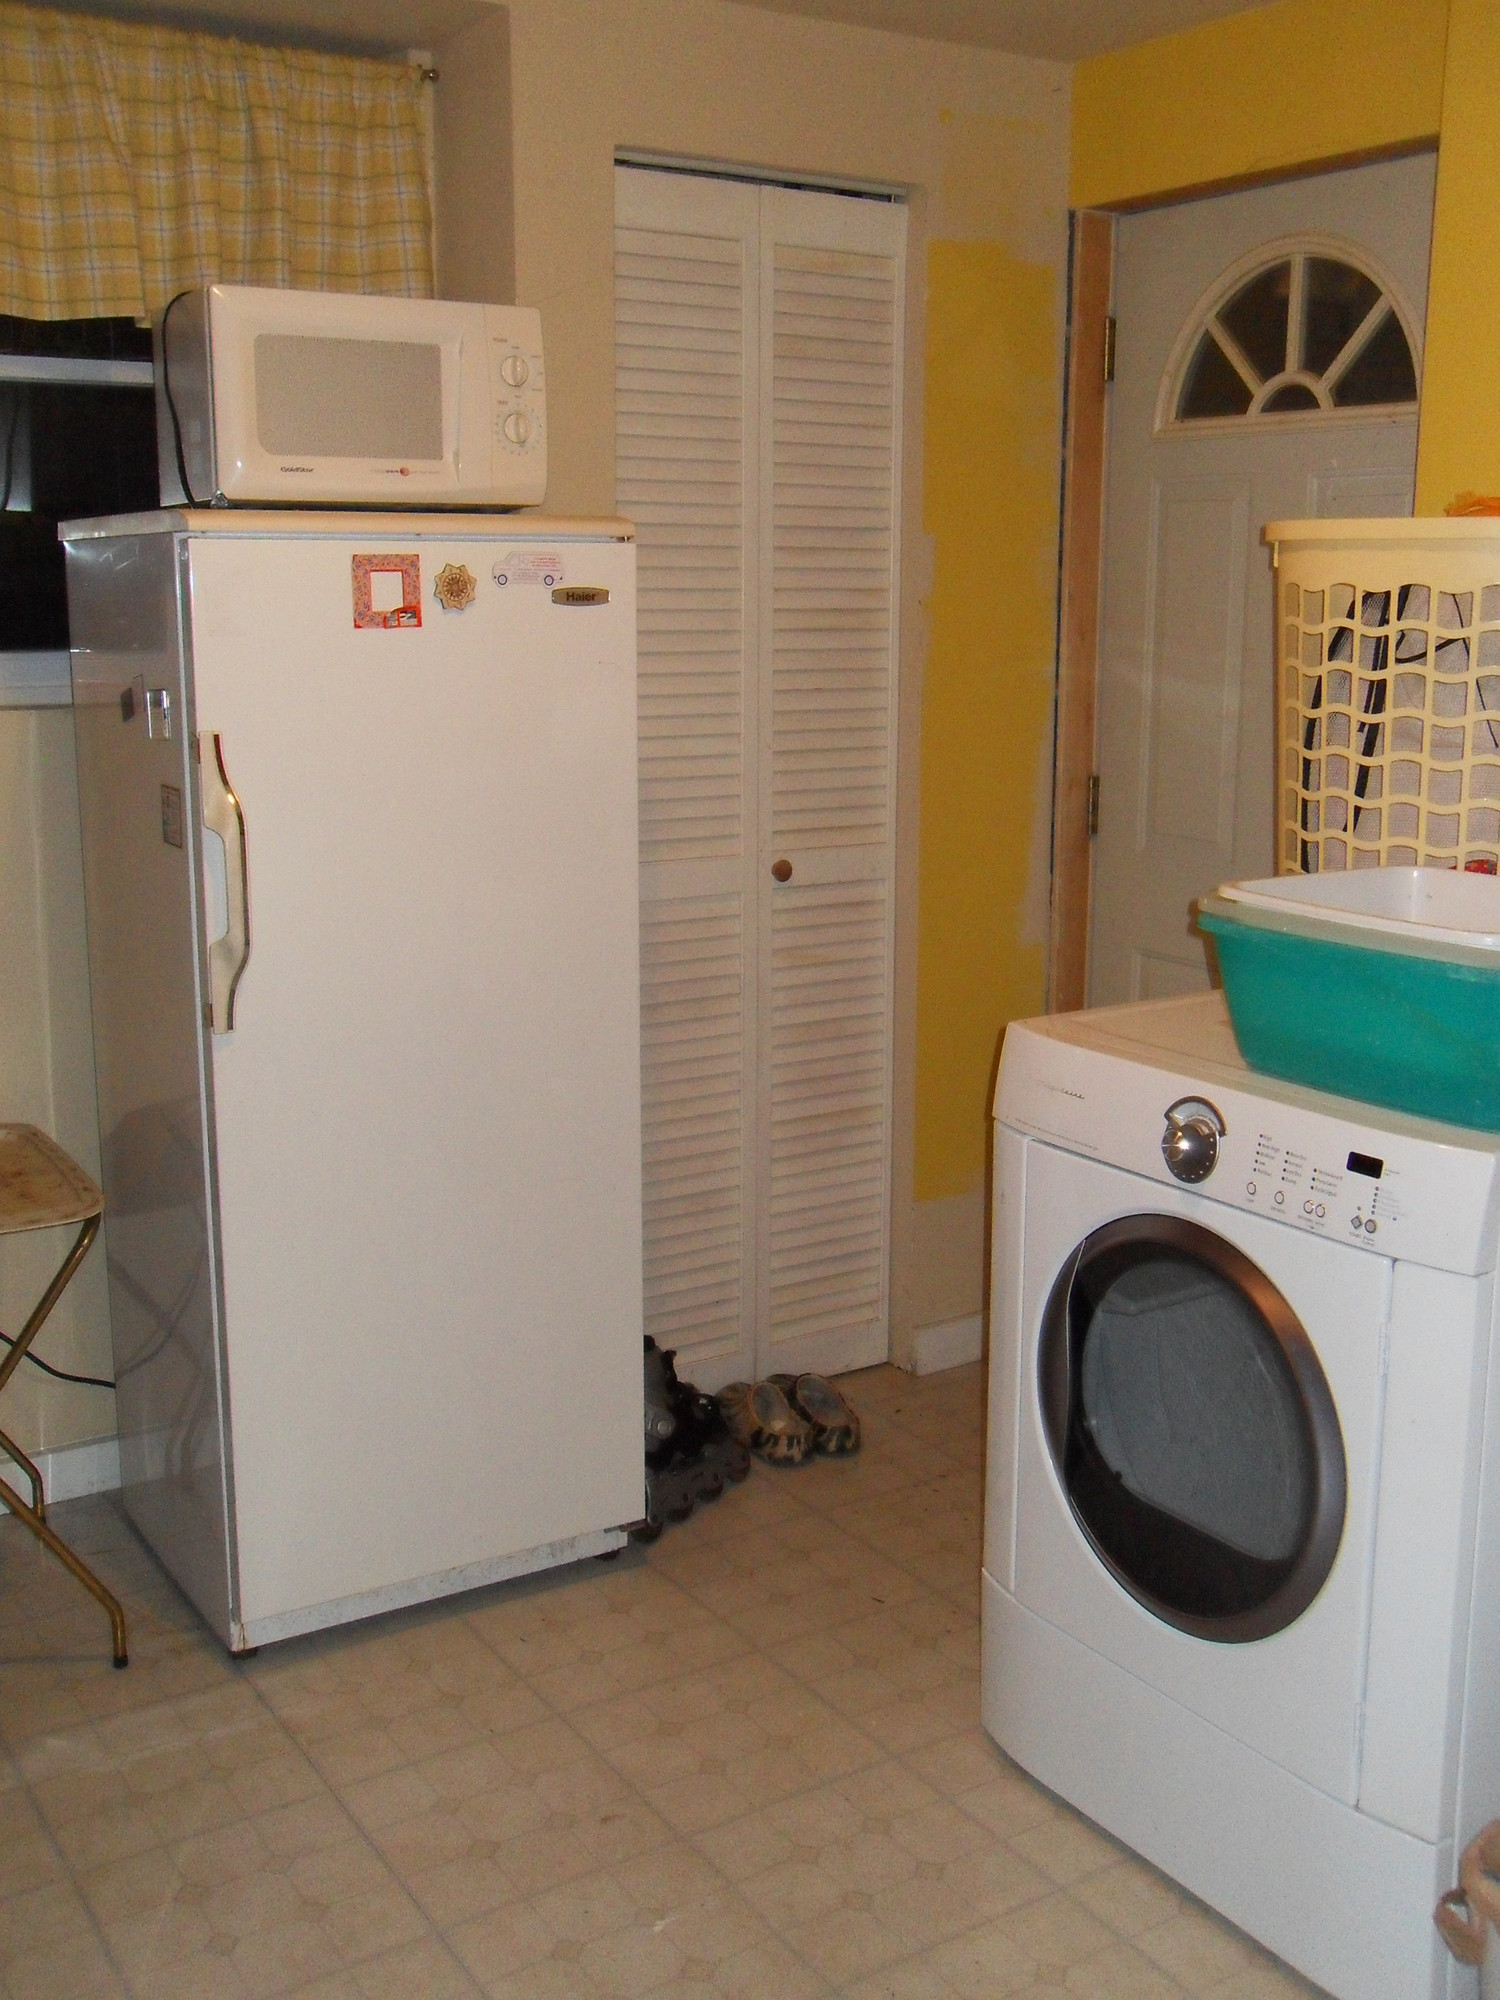 $1300 / 350ft2 - $1100 /1br Semi-Basement (350 sq.ft) for Rent in Rockville, MD